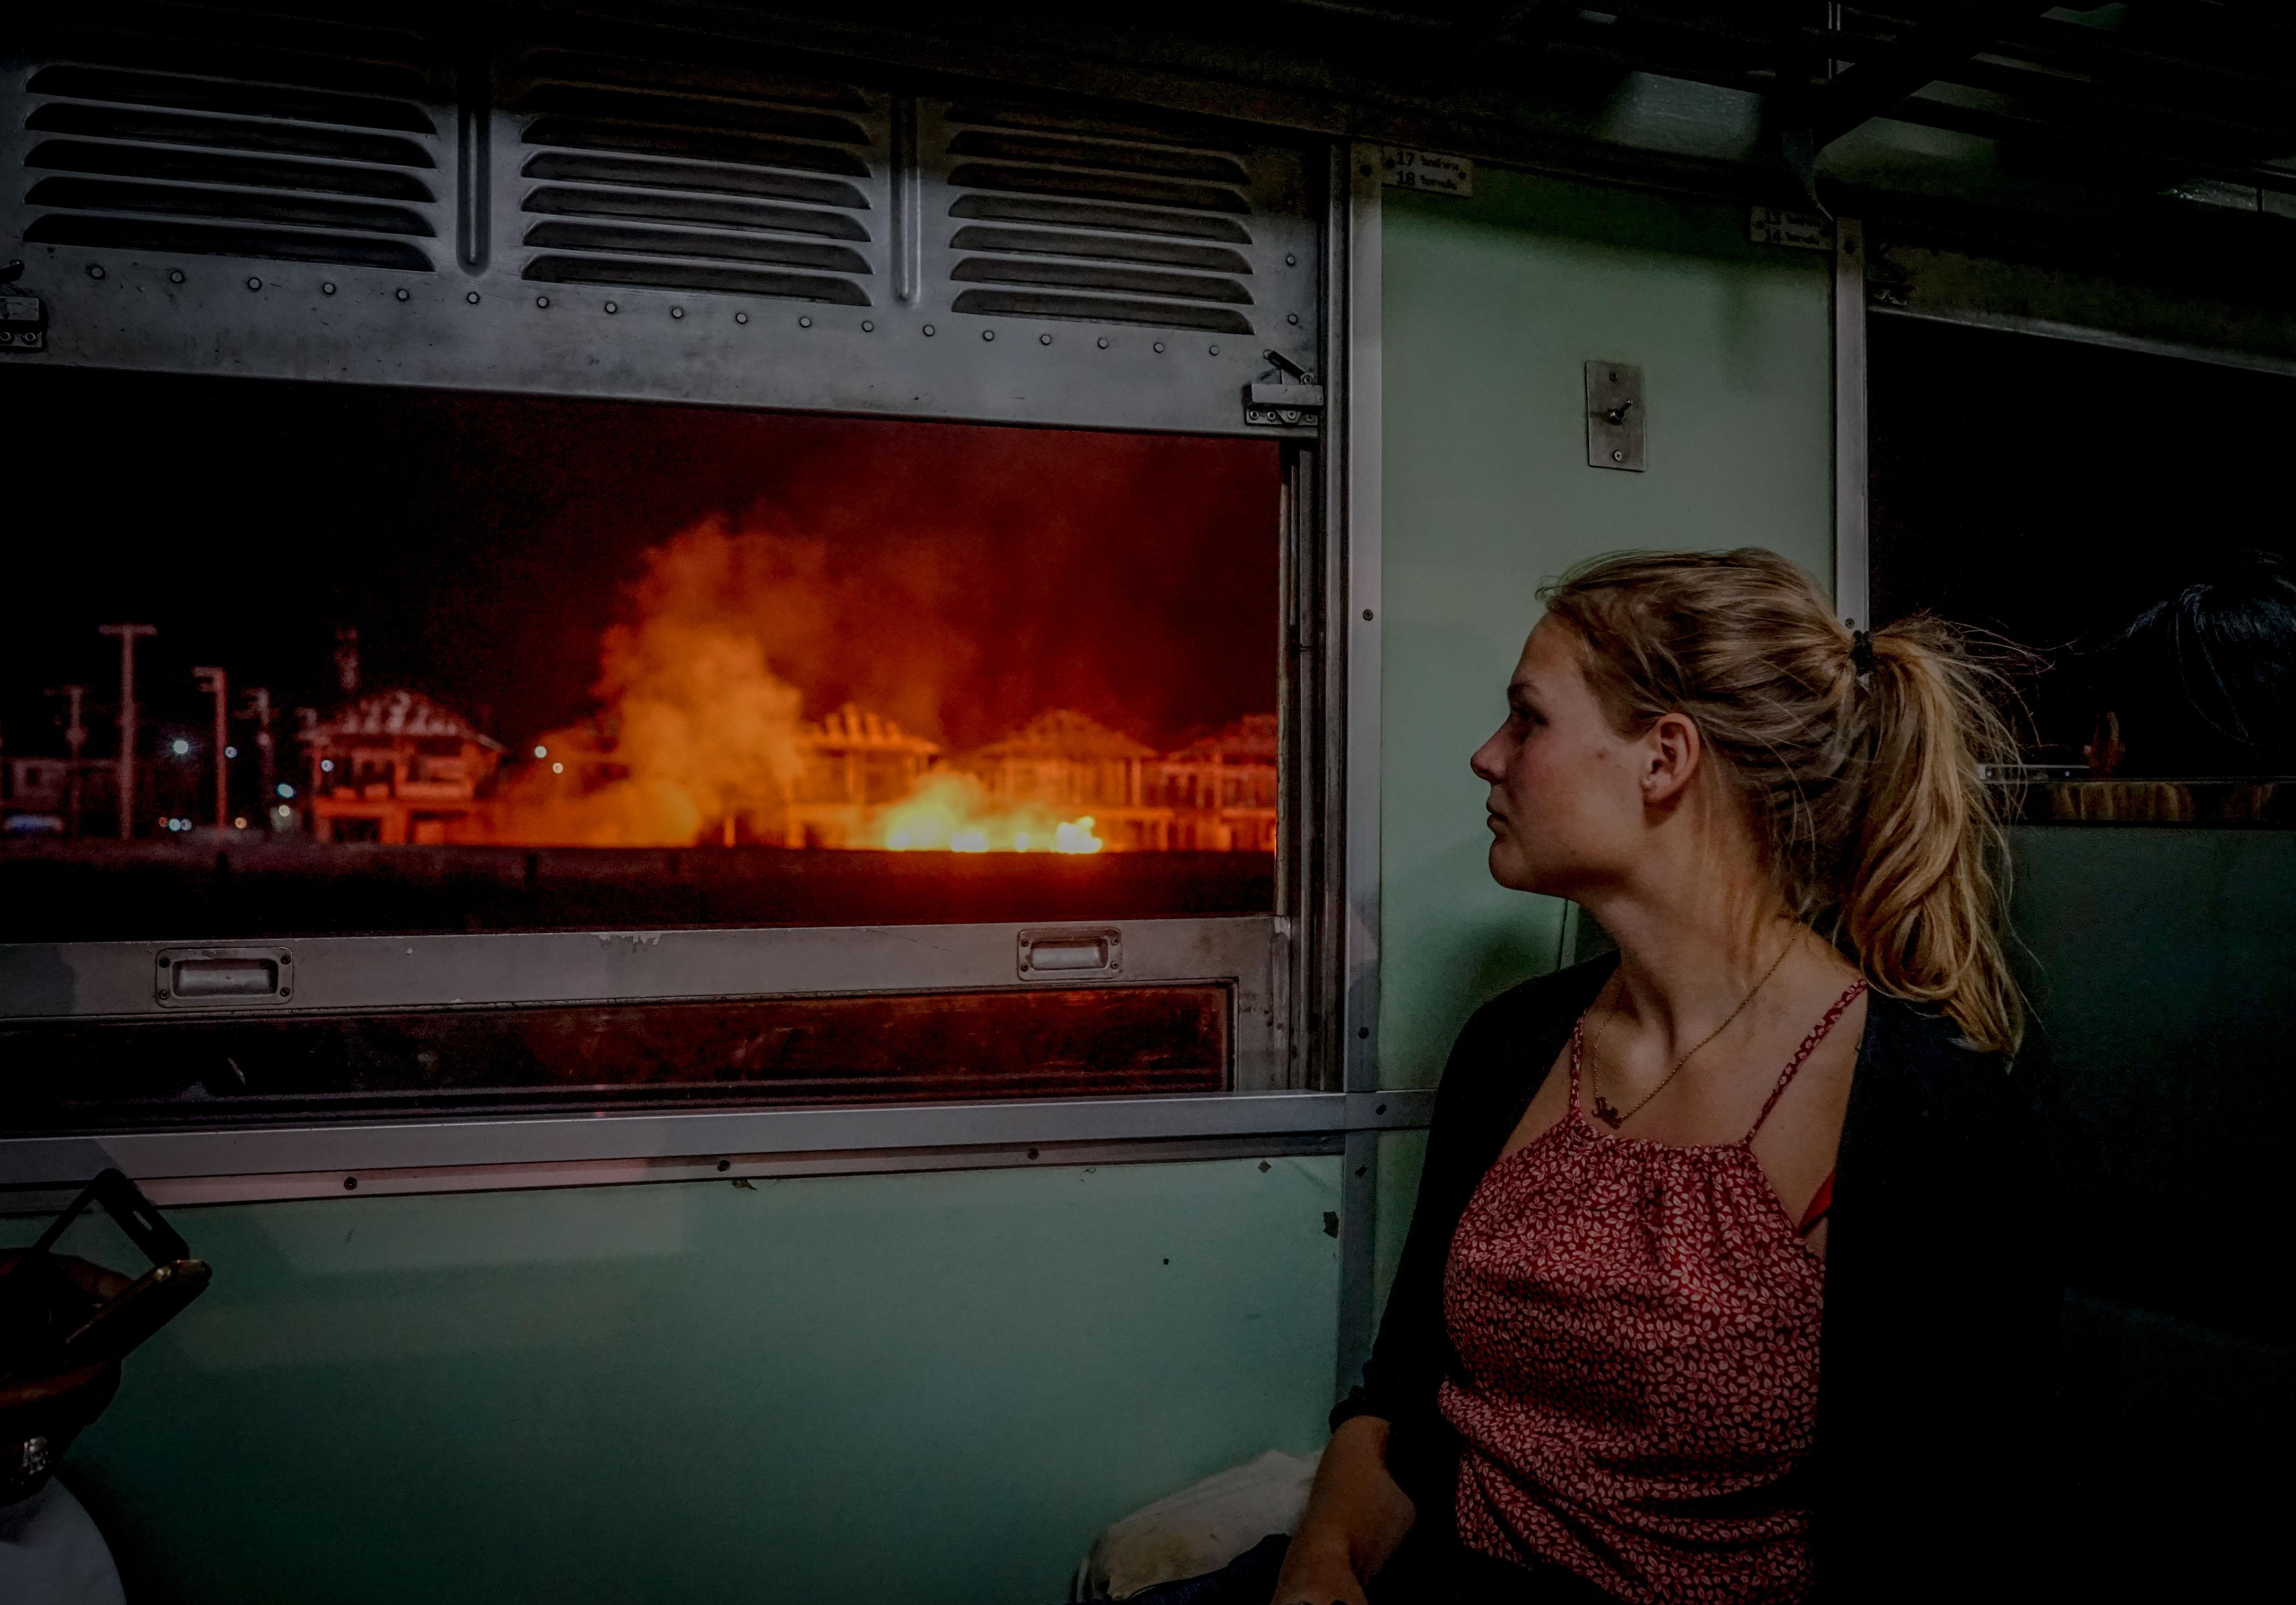 woman sitting along window